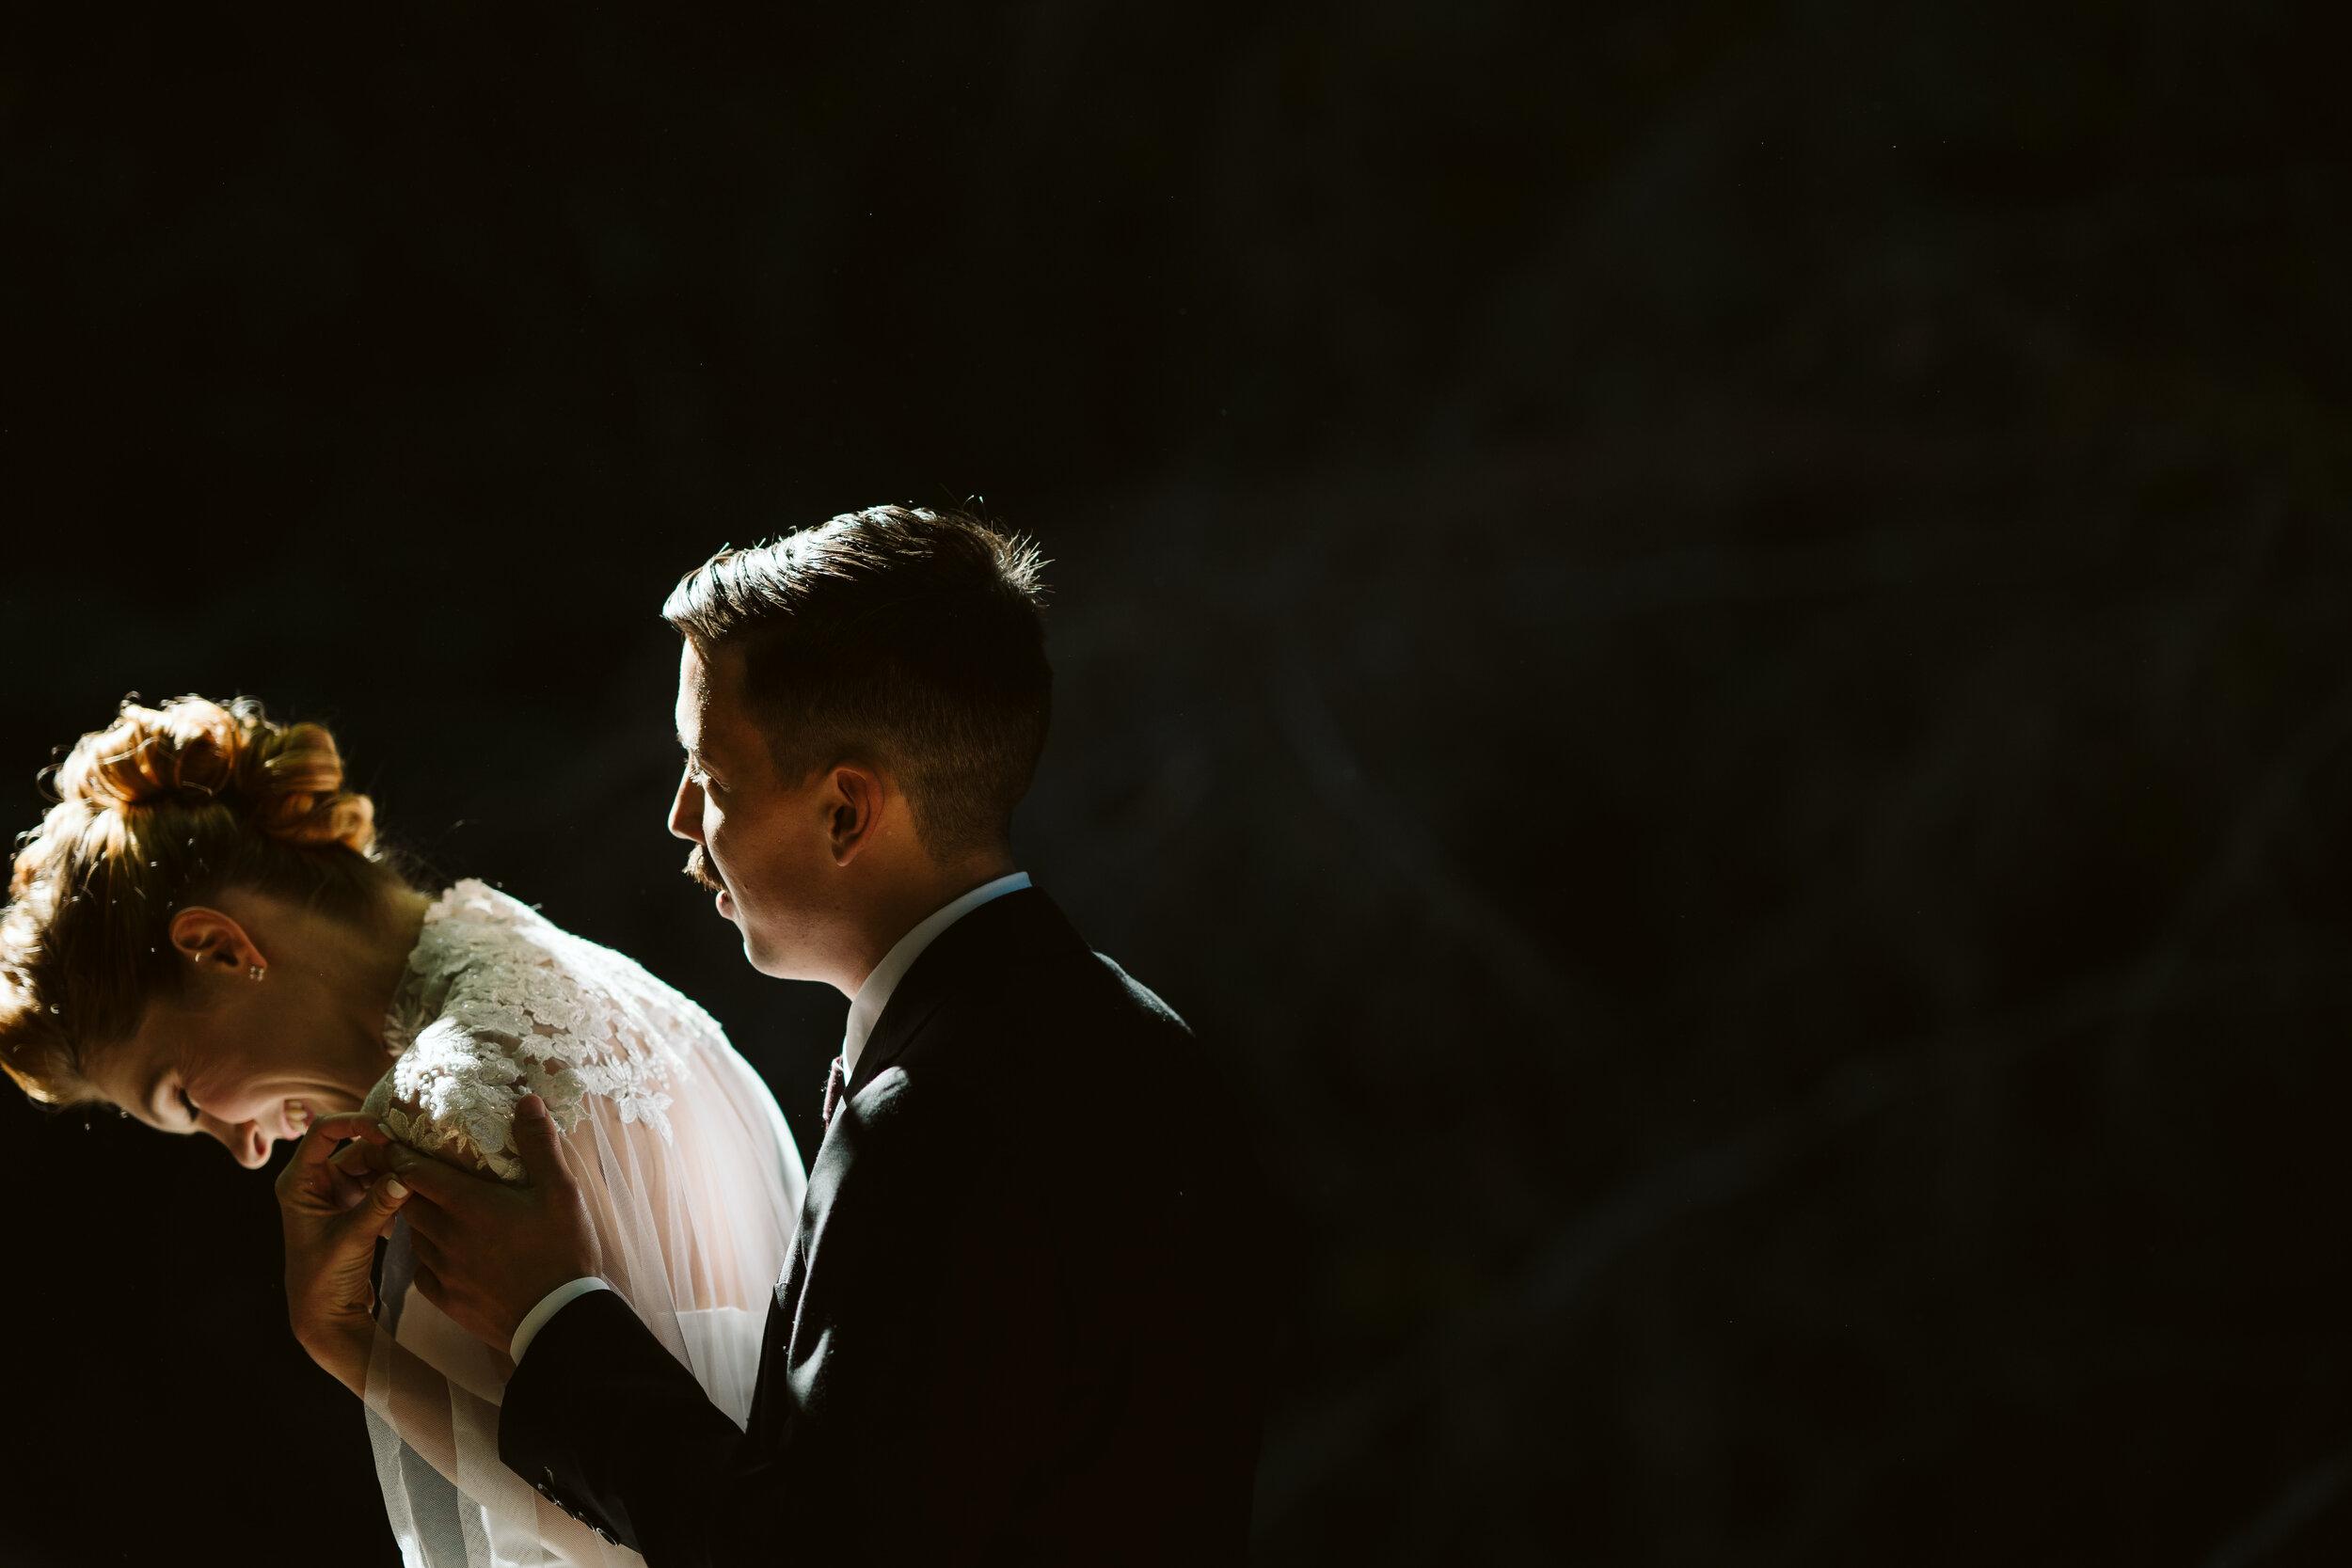 Dramatic Wedding Photography - SF Bay Area, Los Angeles & destinations beyond